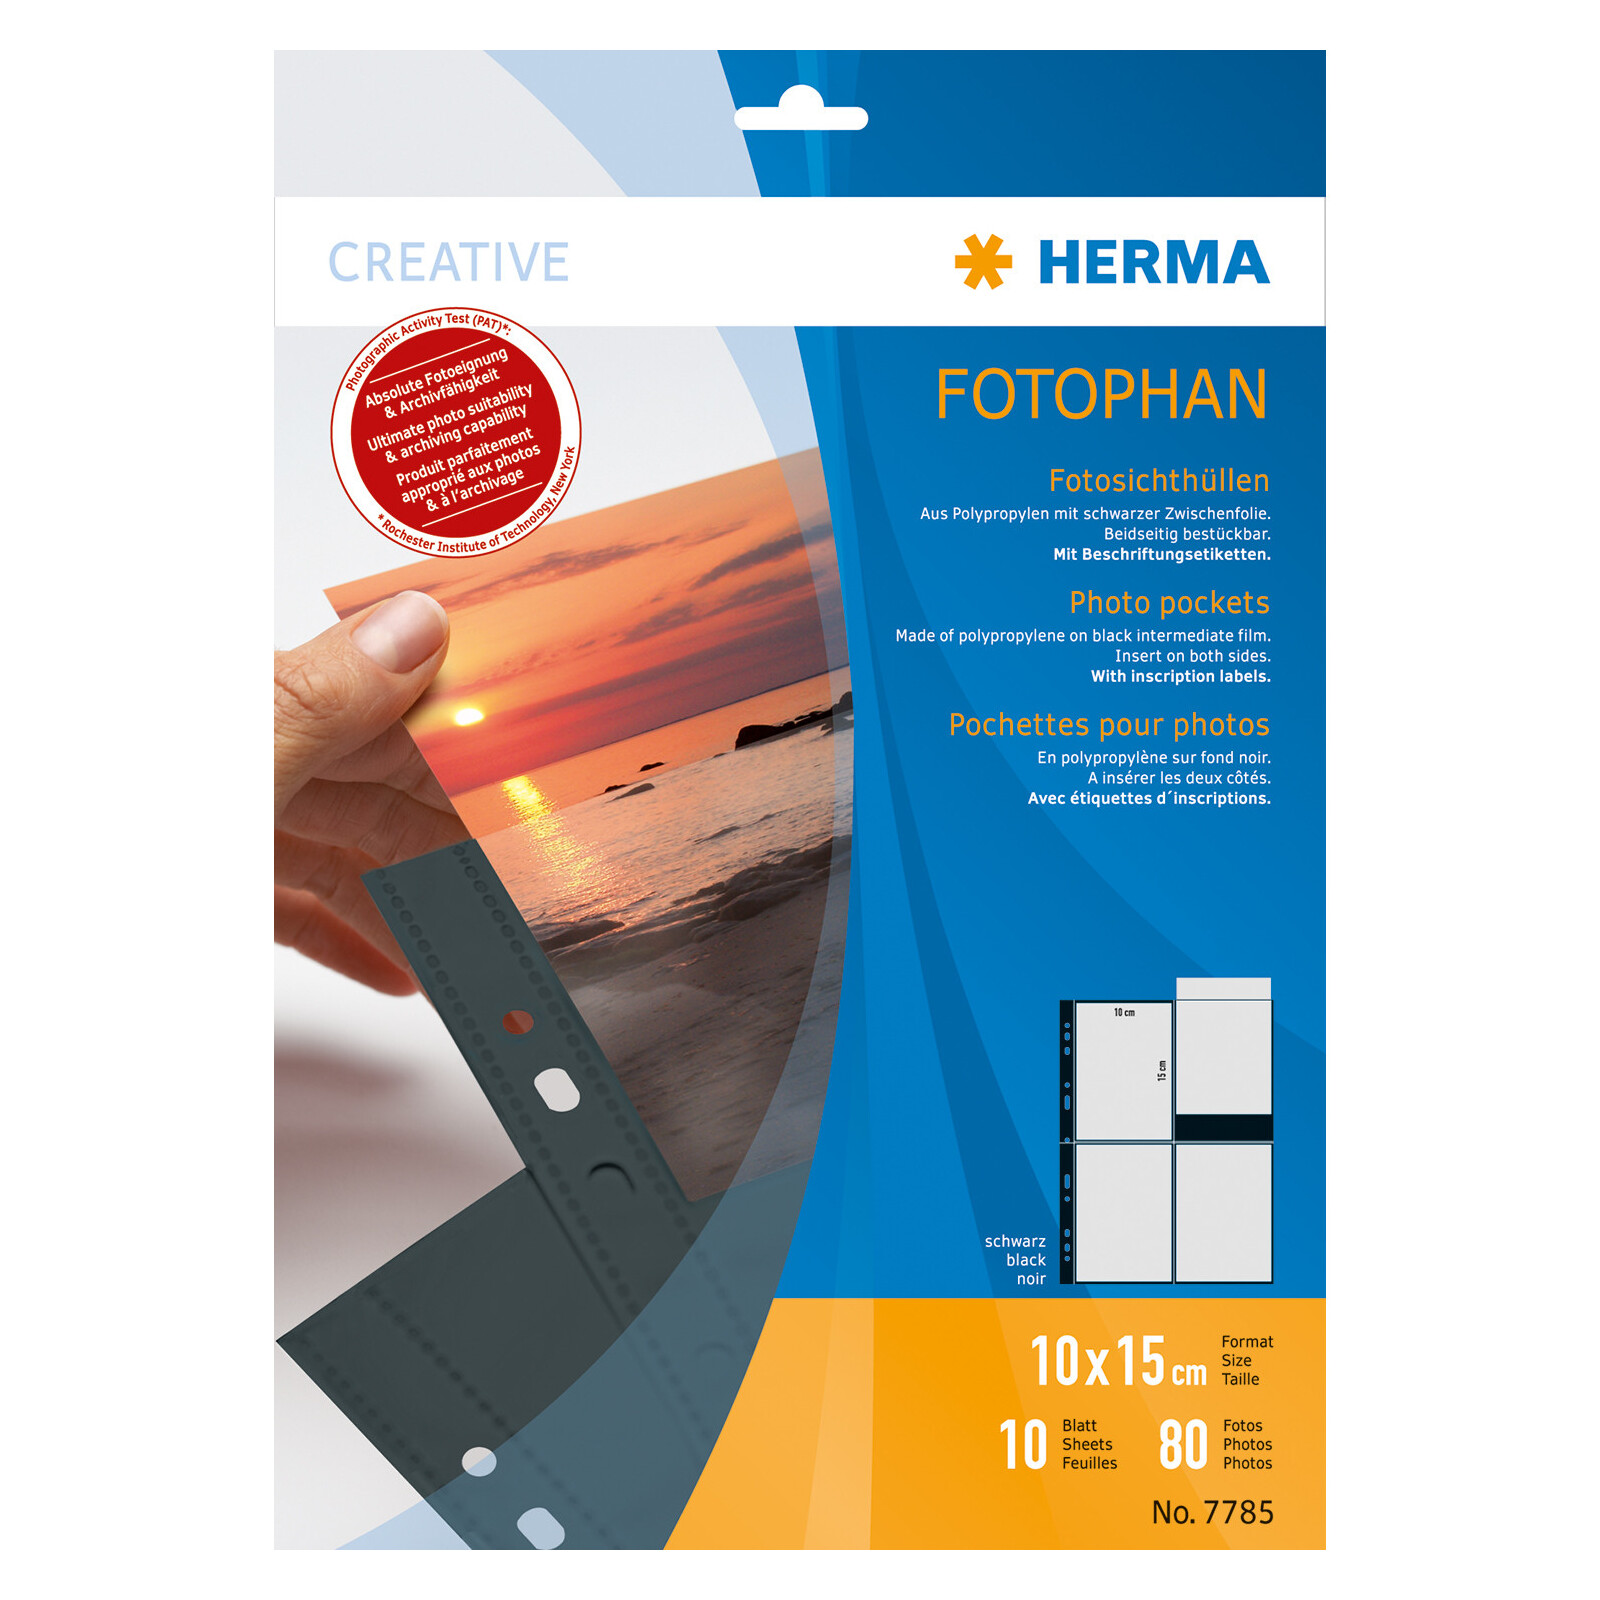 Herma 7785 Fotophan 10x15 hoch schwarz